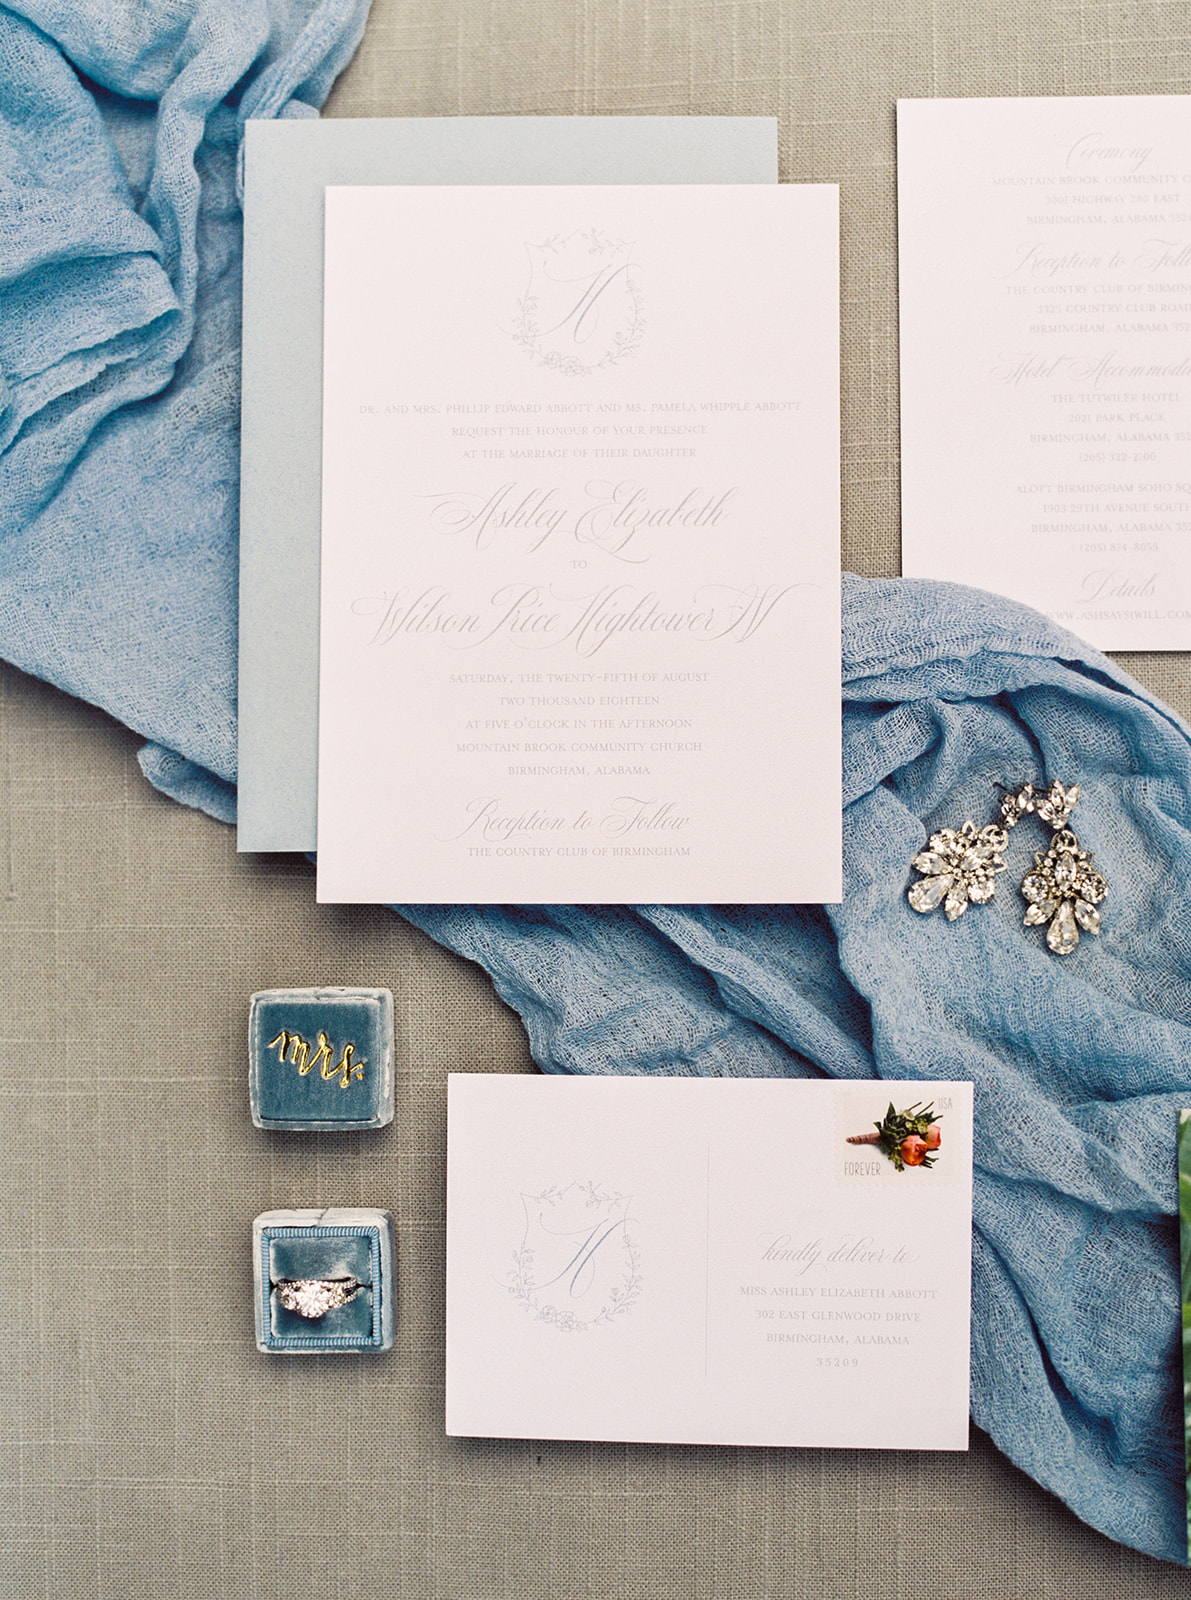 Wedding invitation suite | Birmingham, Alabama wedding | Taylor Dane Photography | Custom wedding invitations by Little Fox Paperie | Gracie Nunez